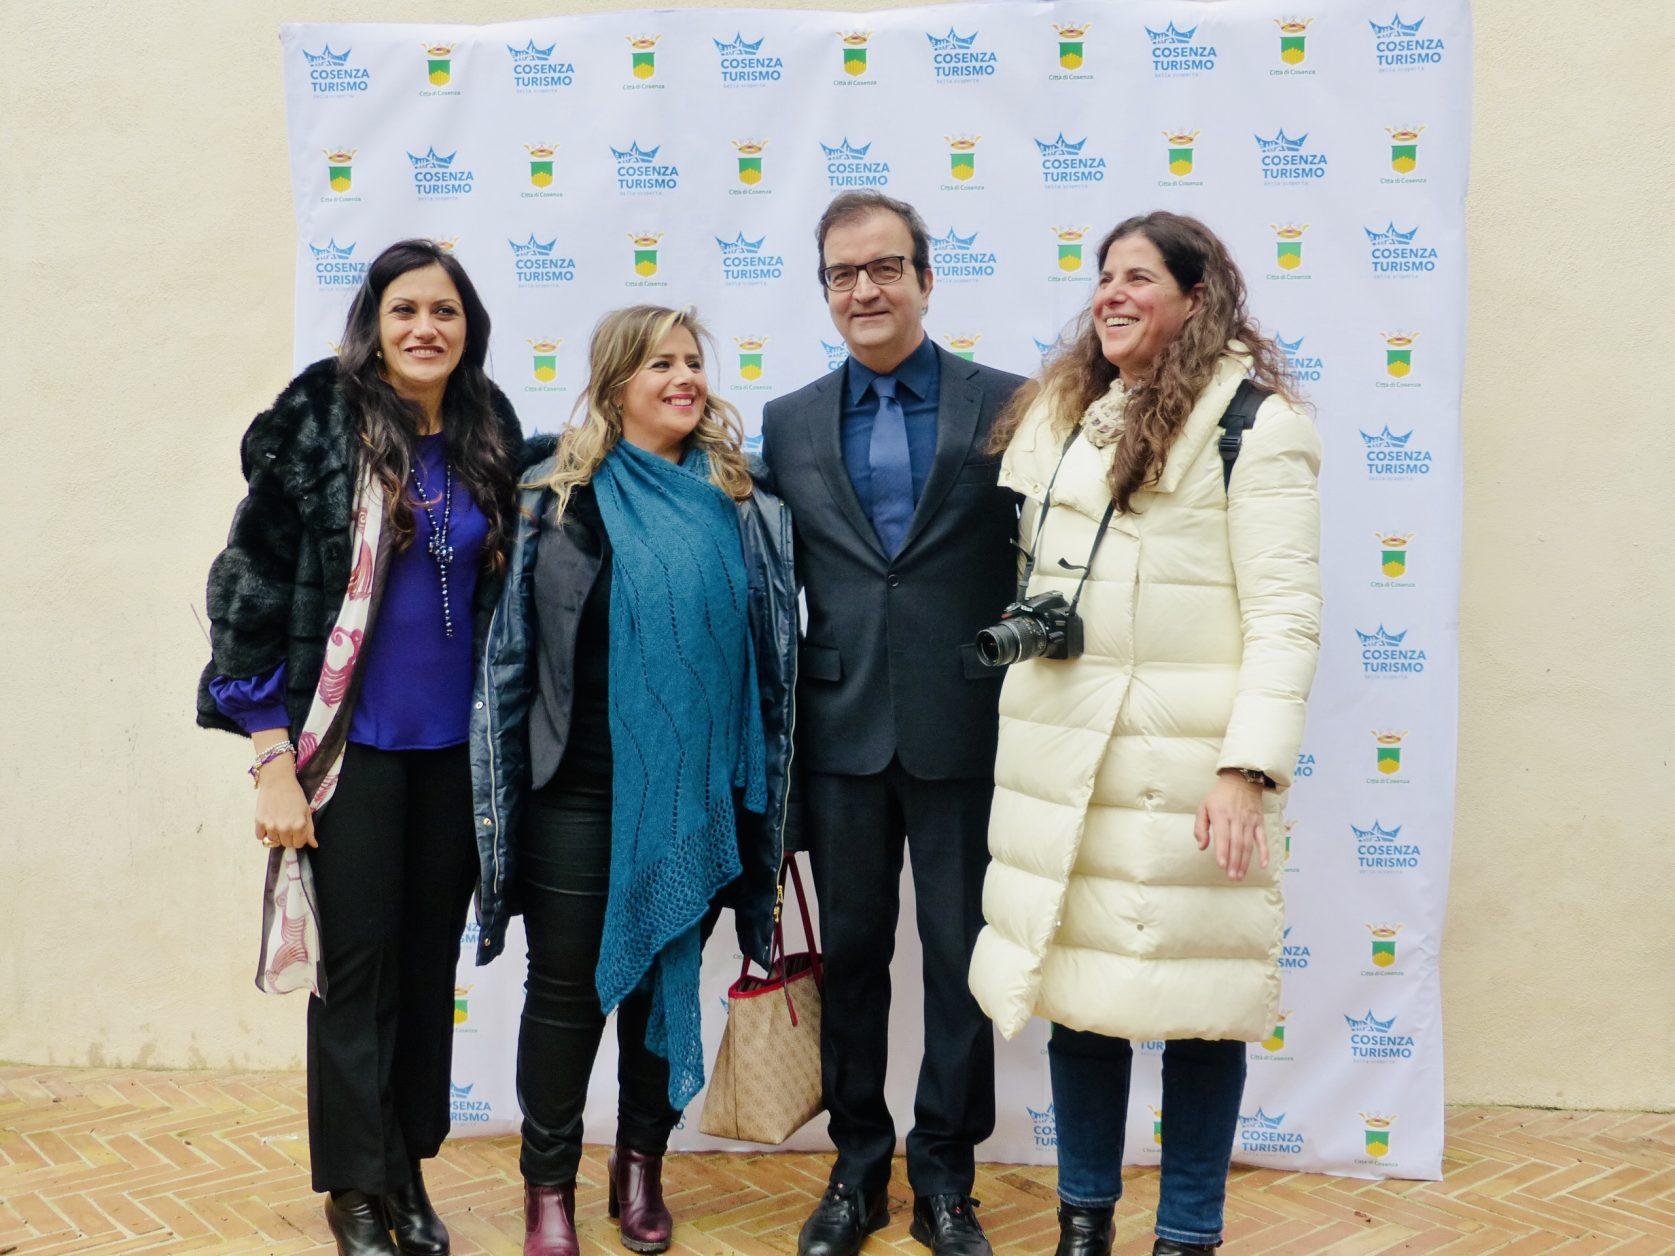 Bürgermeister Mario Occhiuto mit Akteuren des Tourismusforums